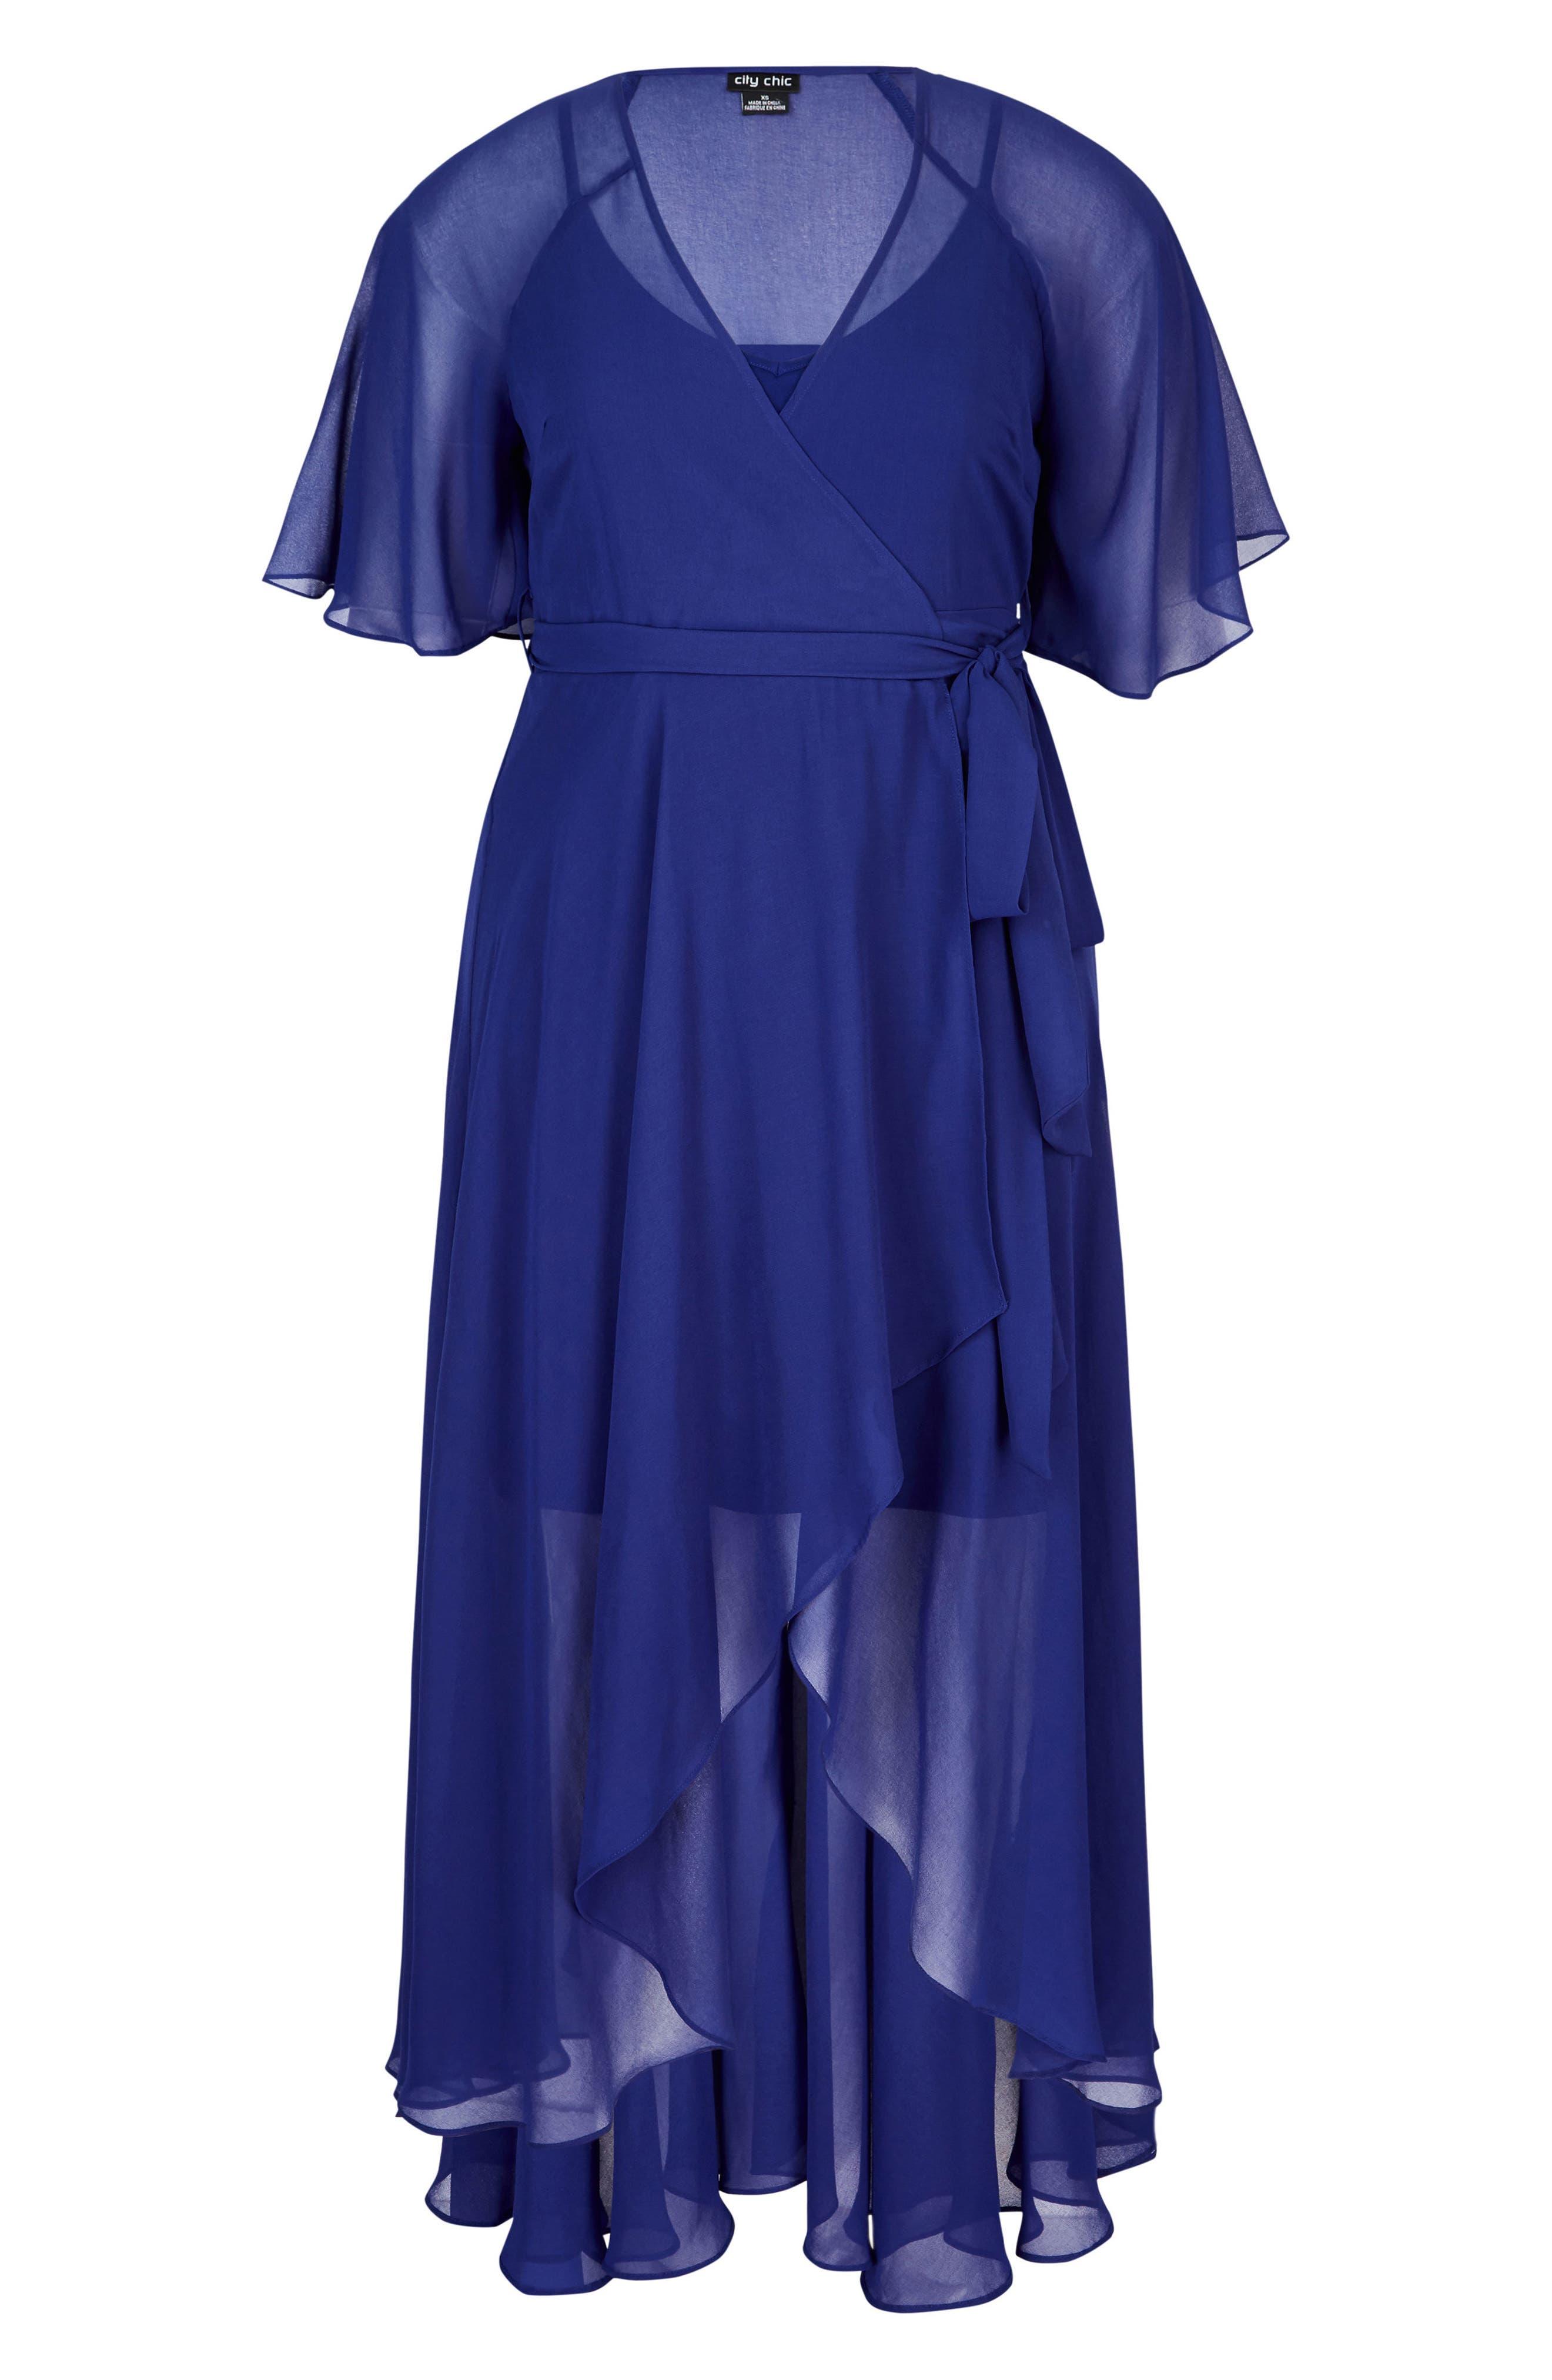 Enthrall Me High/Low Dress,                             Alternate thumbnail 3, color,                             Lapis